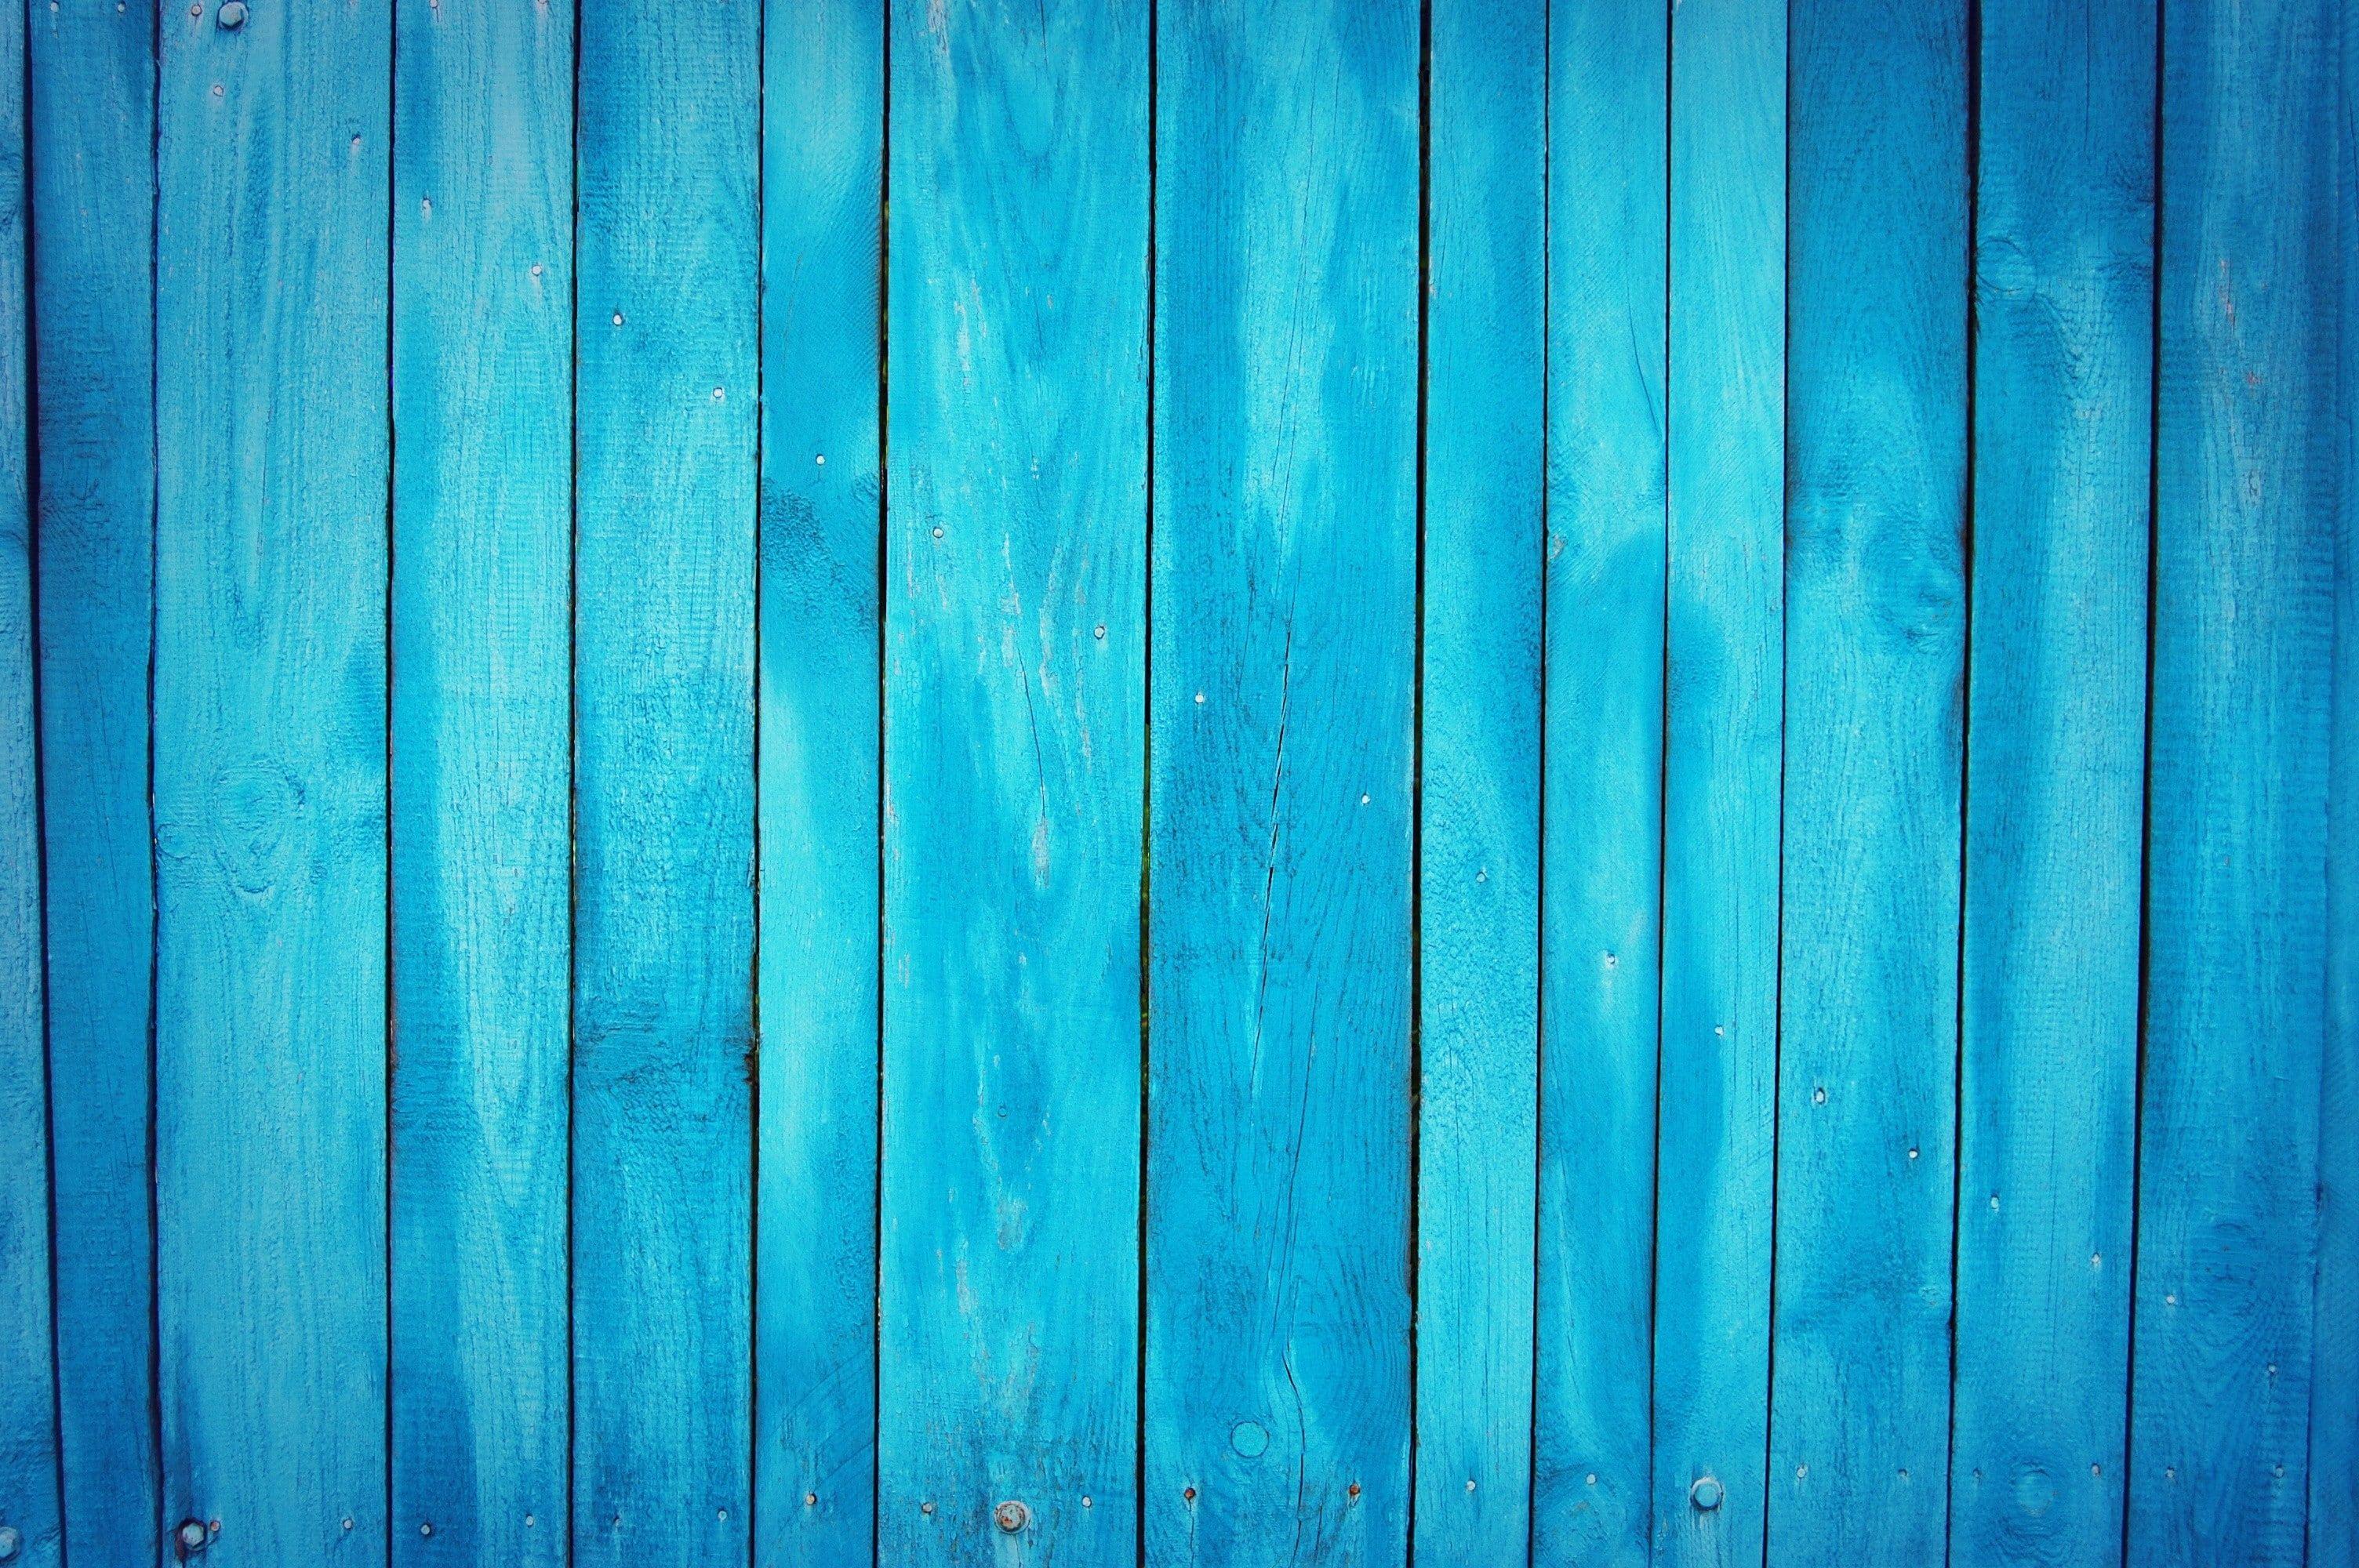 Wooden Surface Texture Wood Blue Wooden Surface Texture Wood Blue 2k Wallpaper Hdwallpaper Desktop Wallpaper Hd Wallpaper Wall Patterns